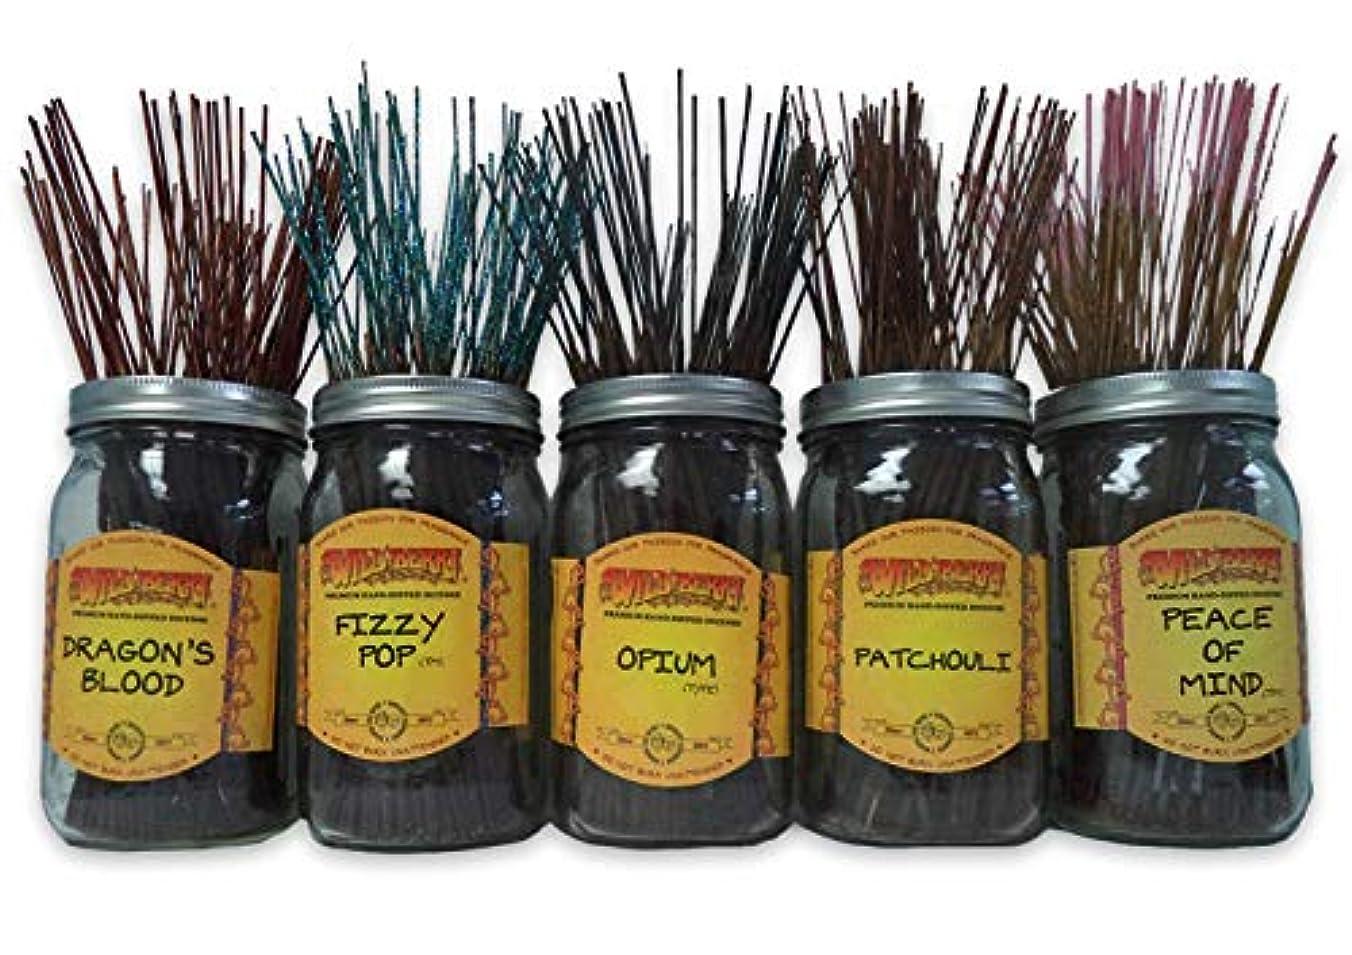 Wild Berry Incense Sticks Best Sellerセット# 1 : 10 Sticks各5の香り、合計50 Sticks 。